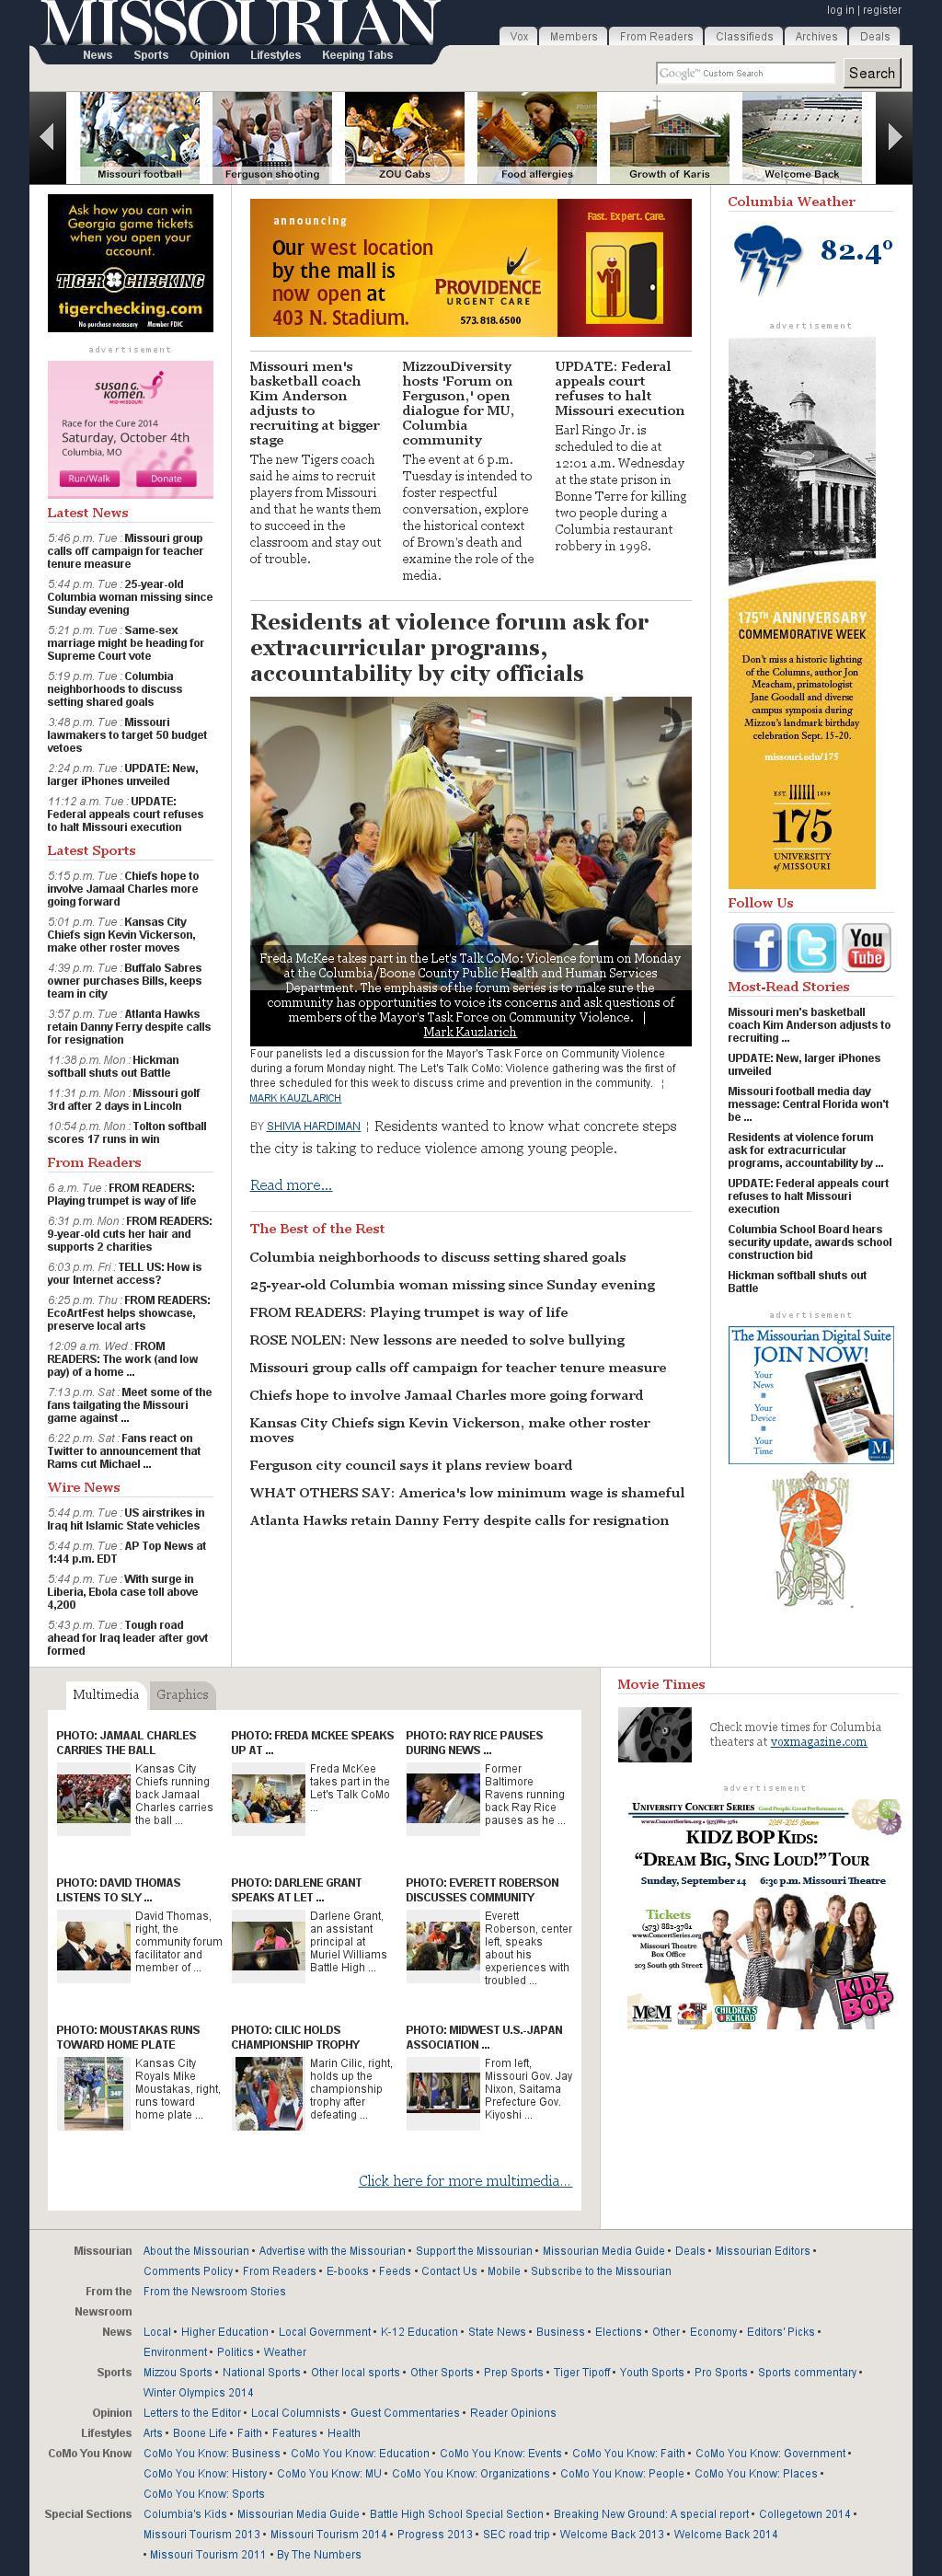 Columbia Missourian at Tuesday Sept. 9, 2014, 11:03 p.m. UTC